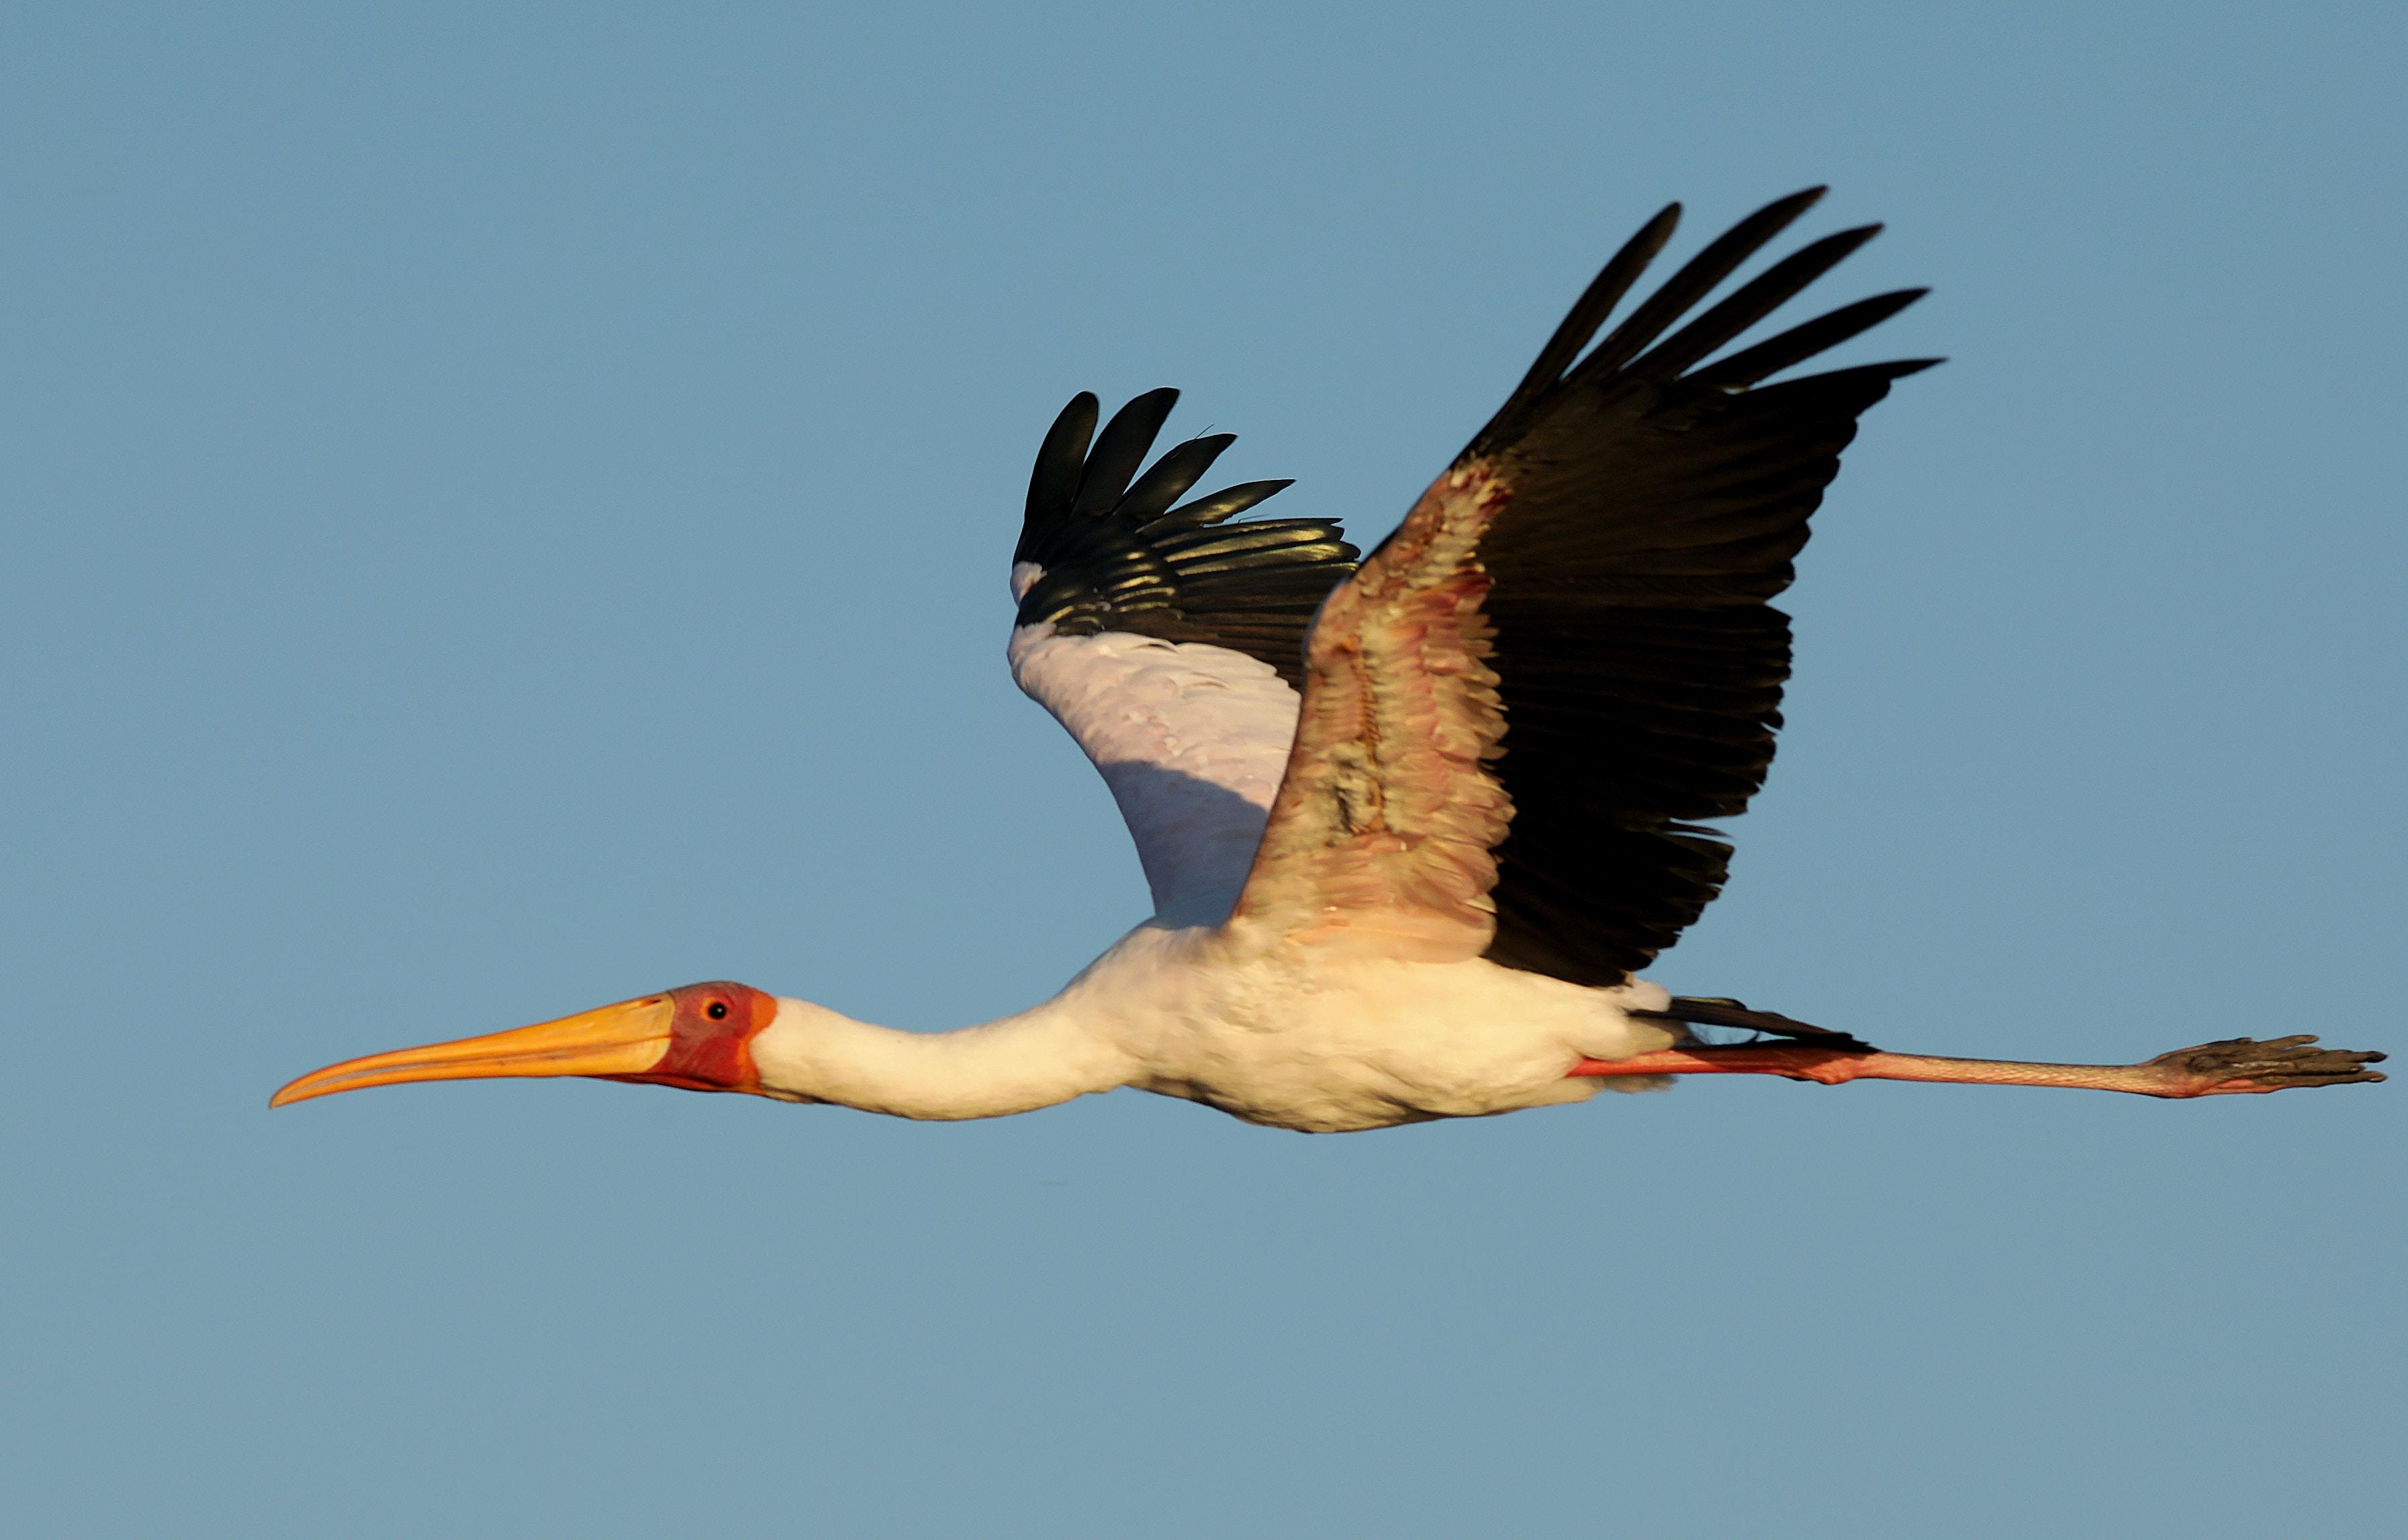 flying white and black crane